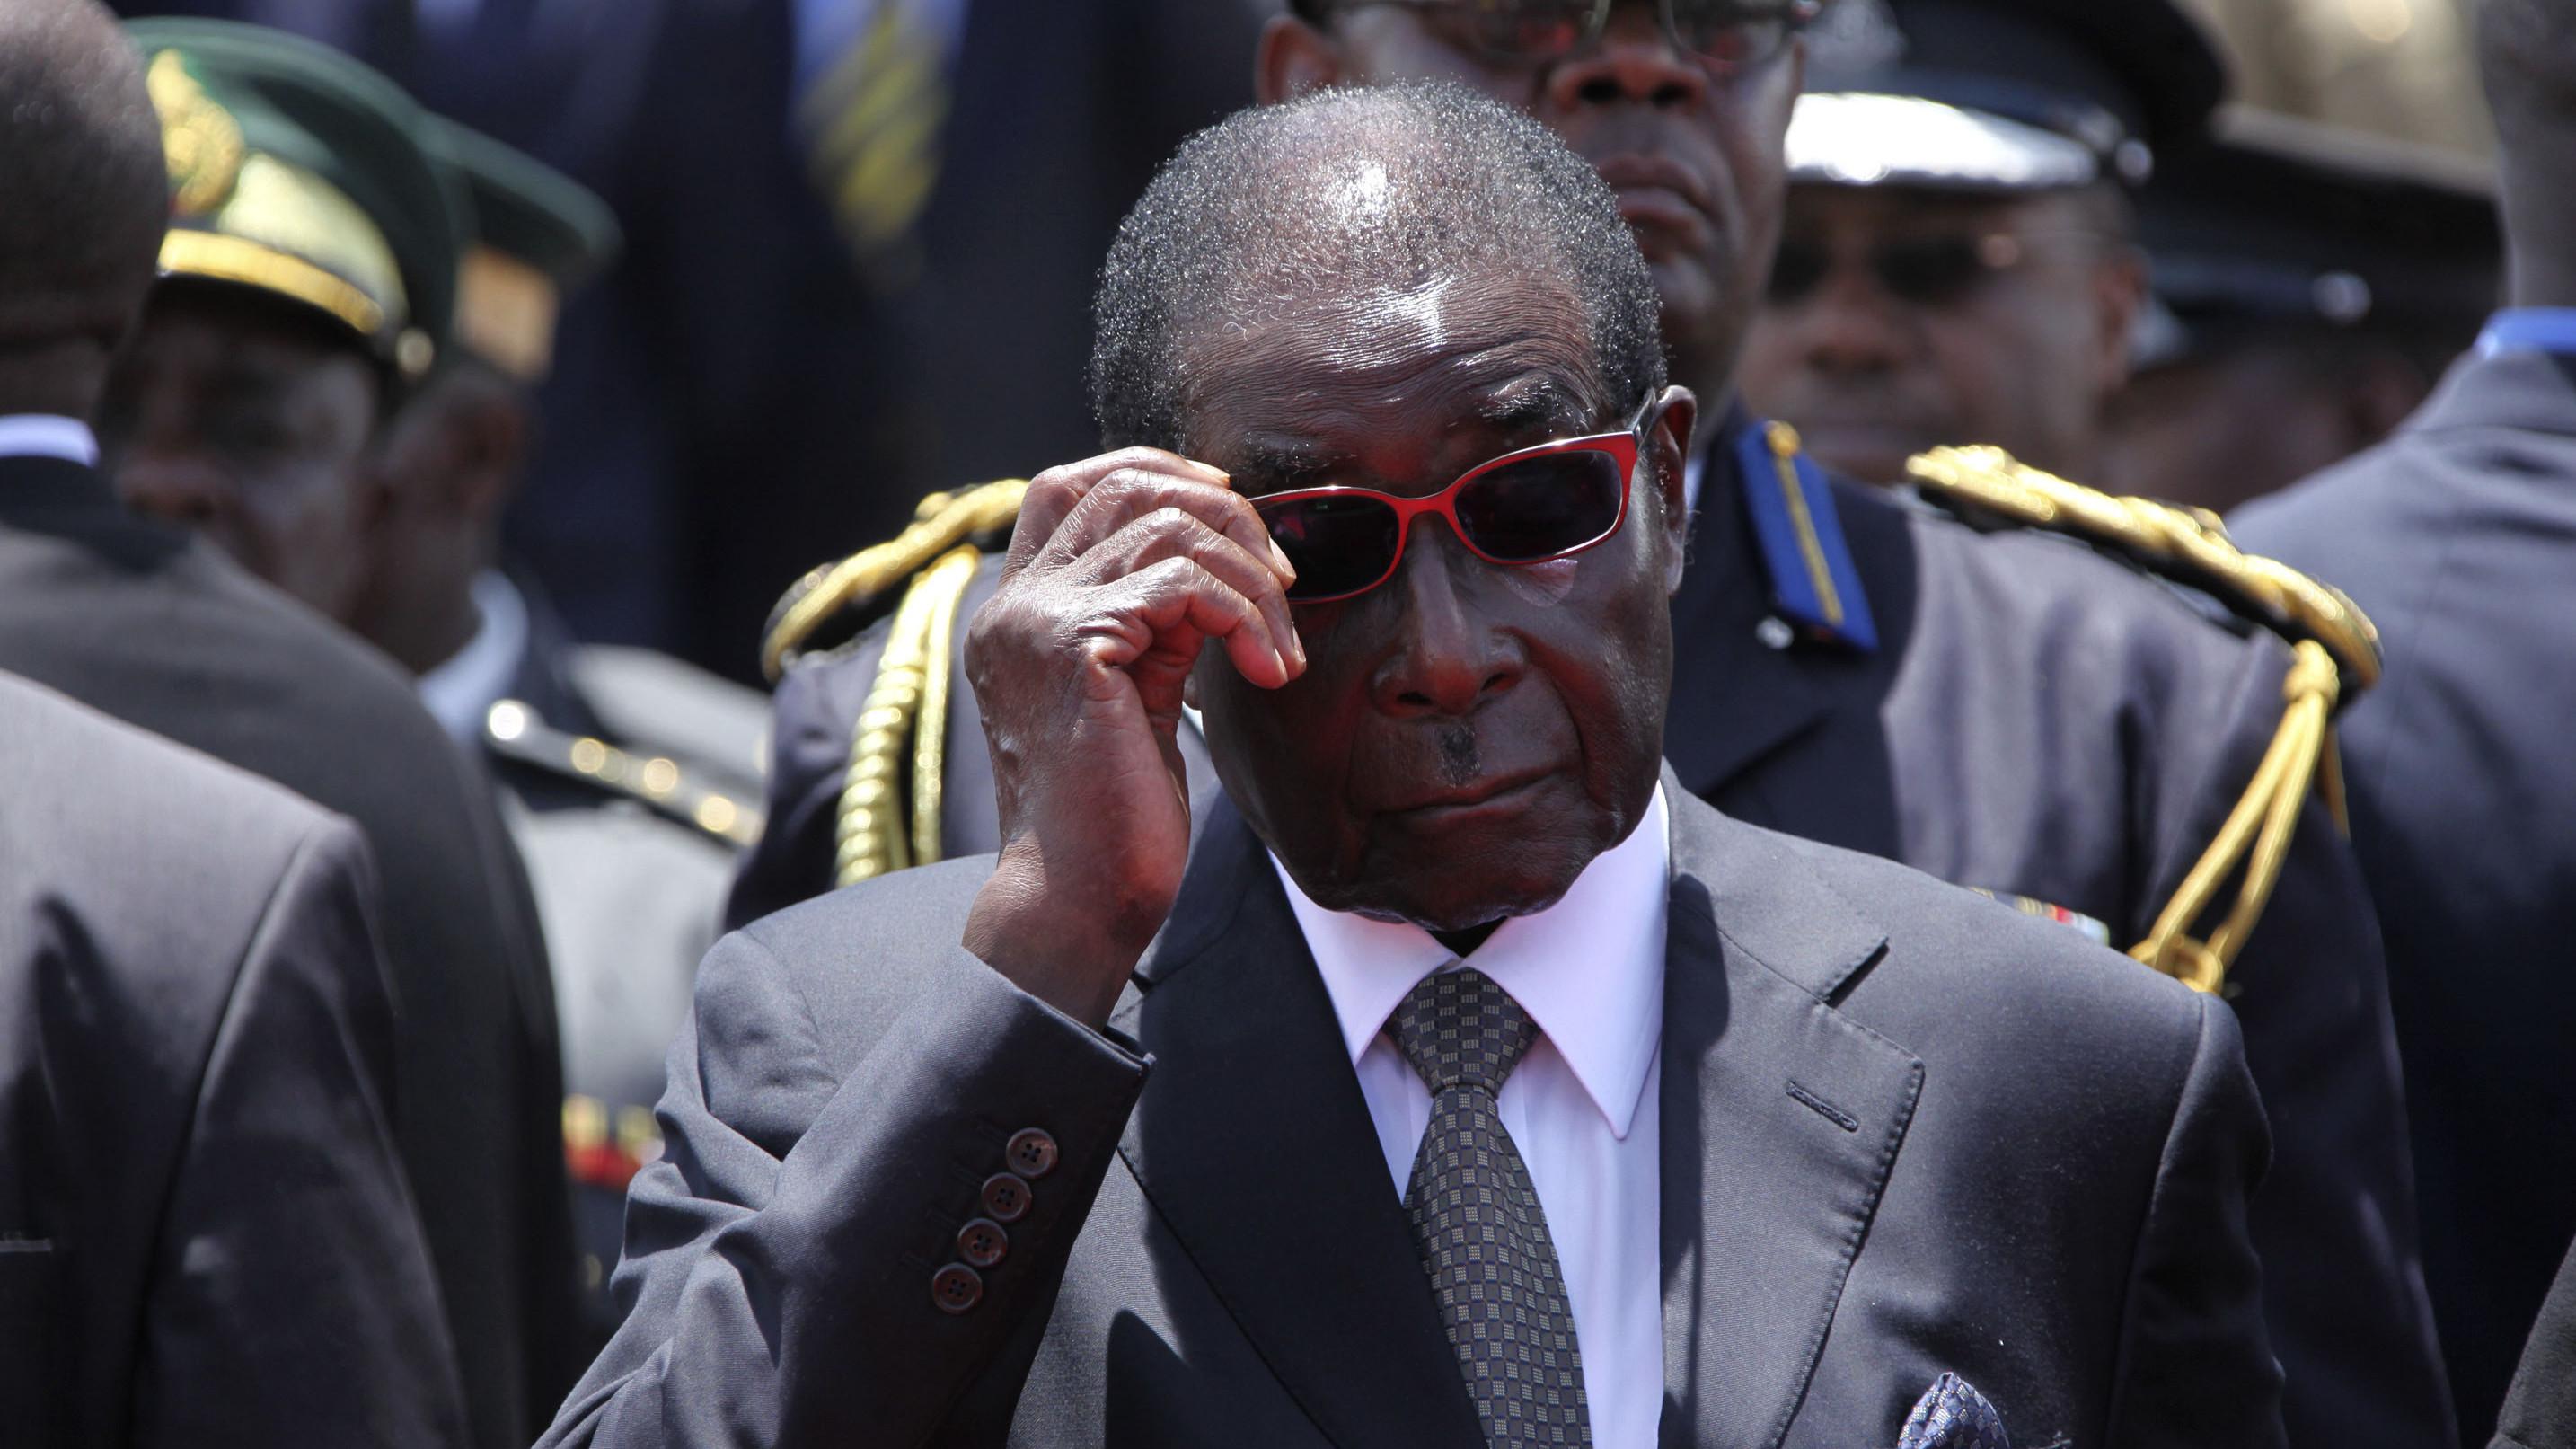 Zimbabwean President Robert Mugabe, attends the burial of Deputy President John Nkomo, at the Heroes Acre, in Harare, Zimbabwe, Monday, Jan, 21, 2013.